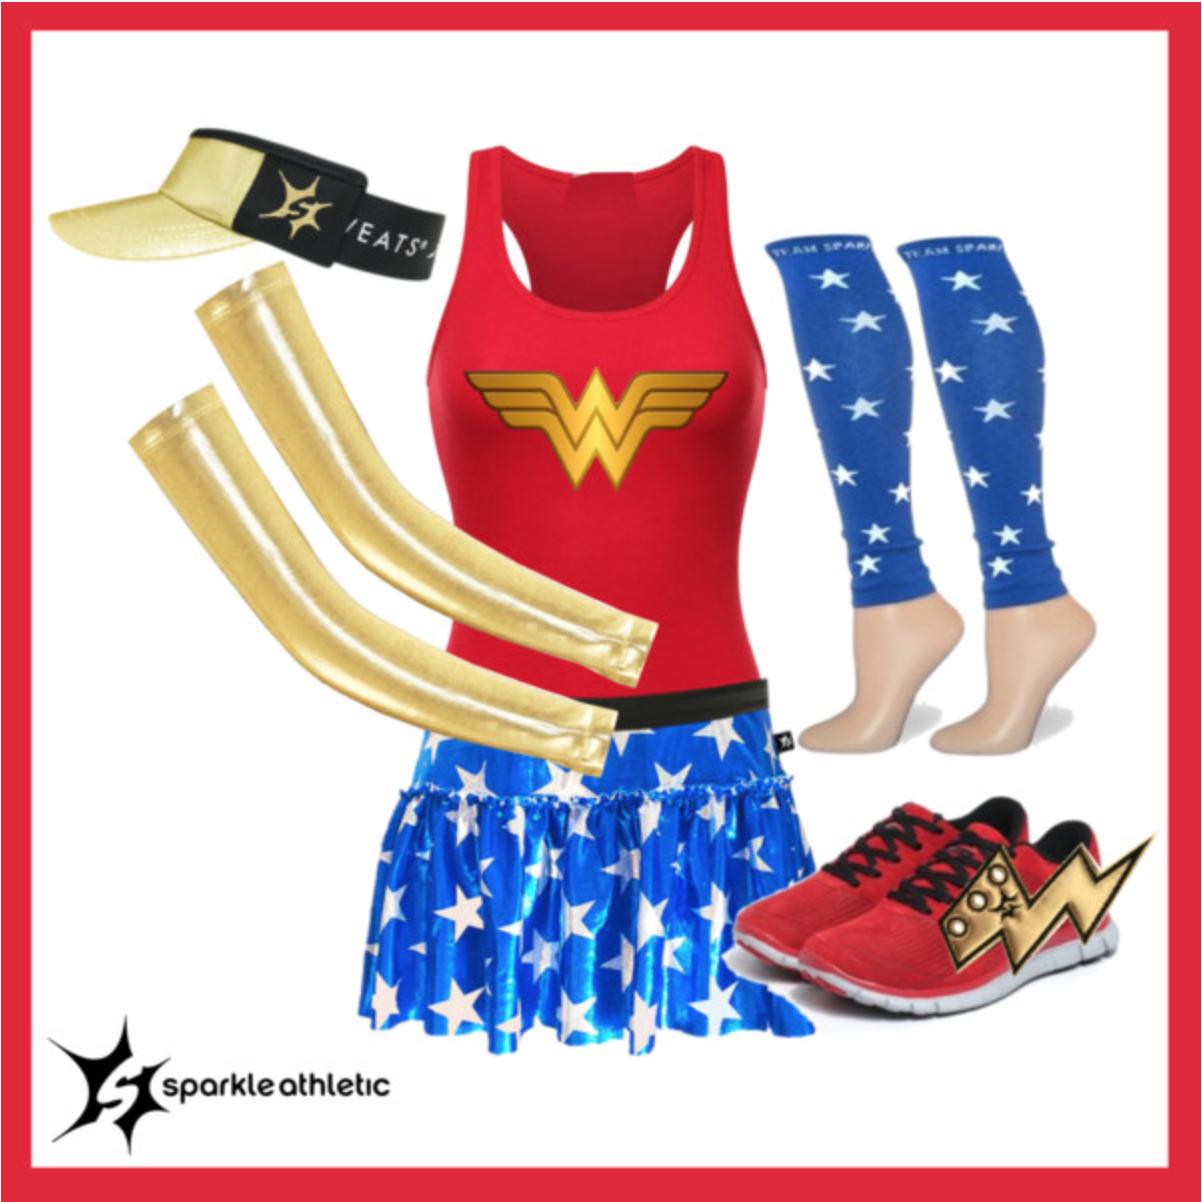 Disney Running Costumes: Walt Disney World 10K | Run ... |Disney Running Costumes Ideas Women